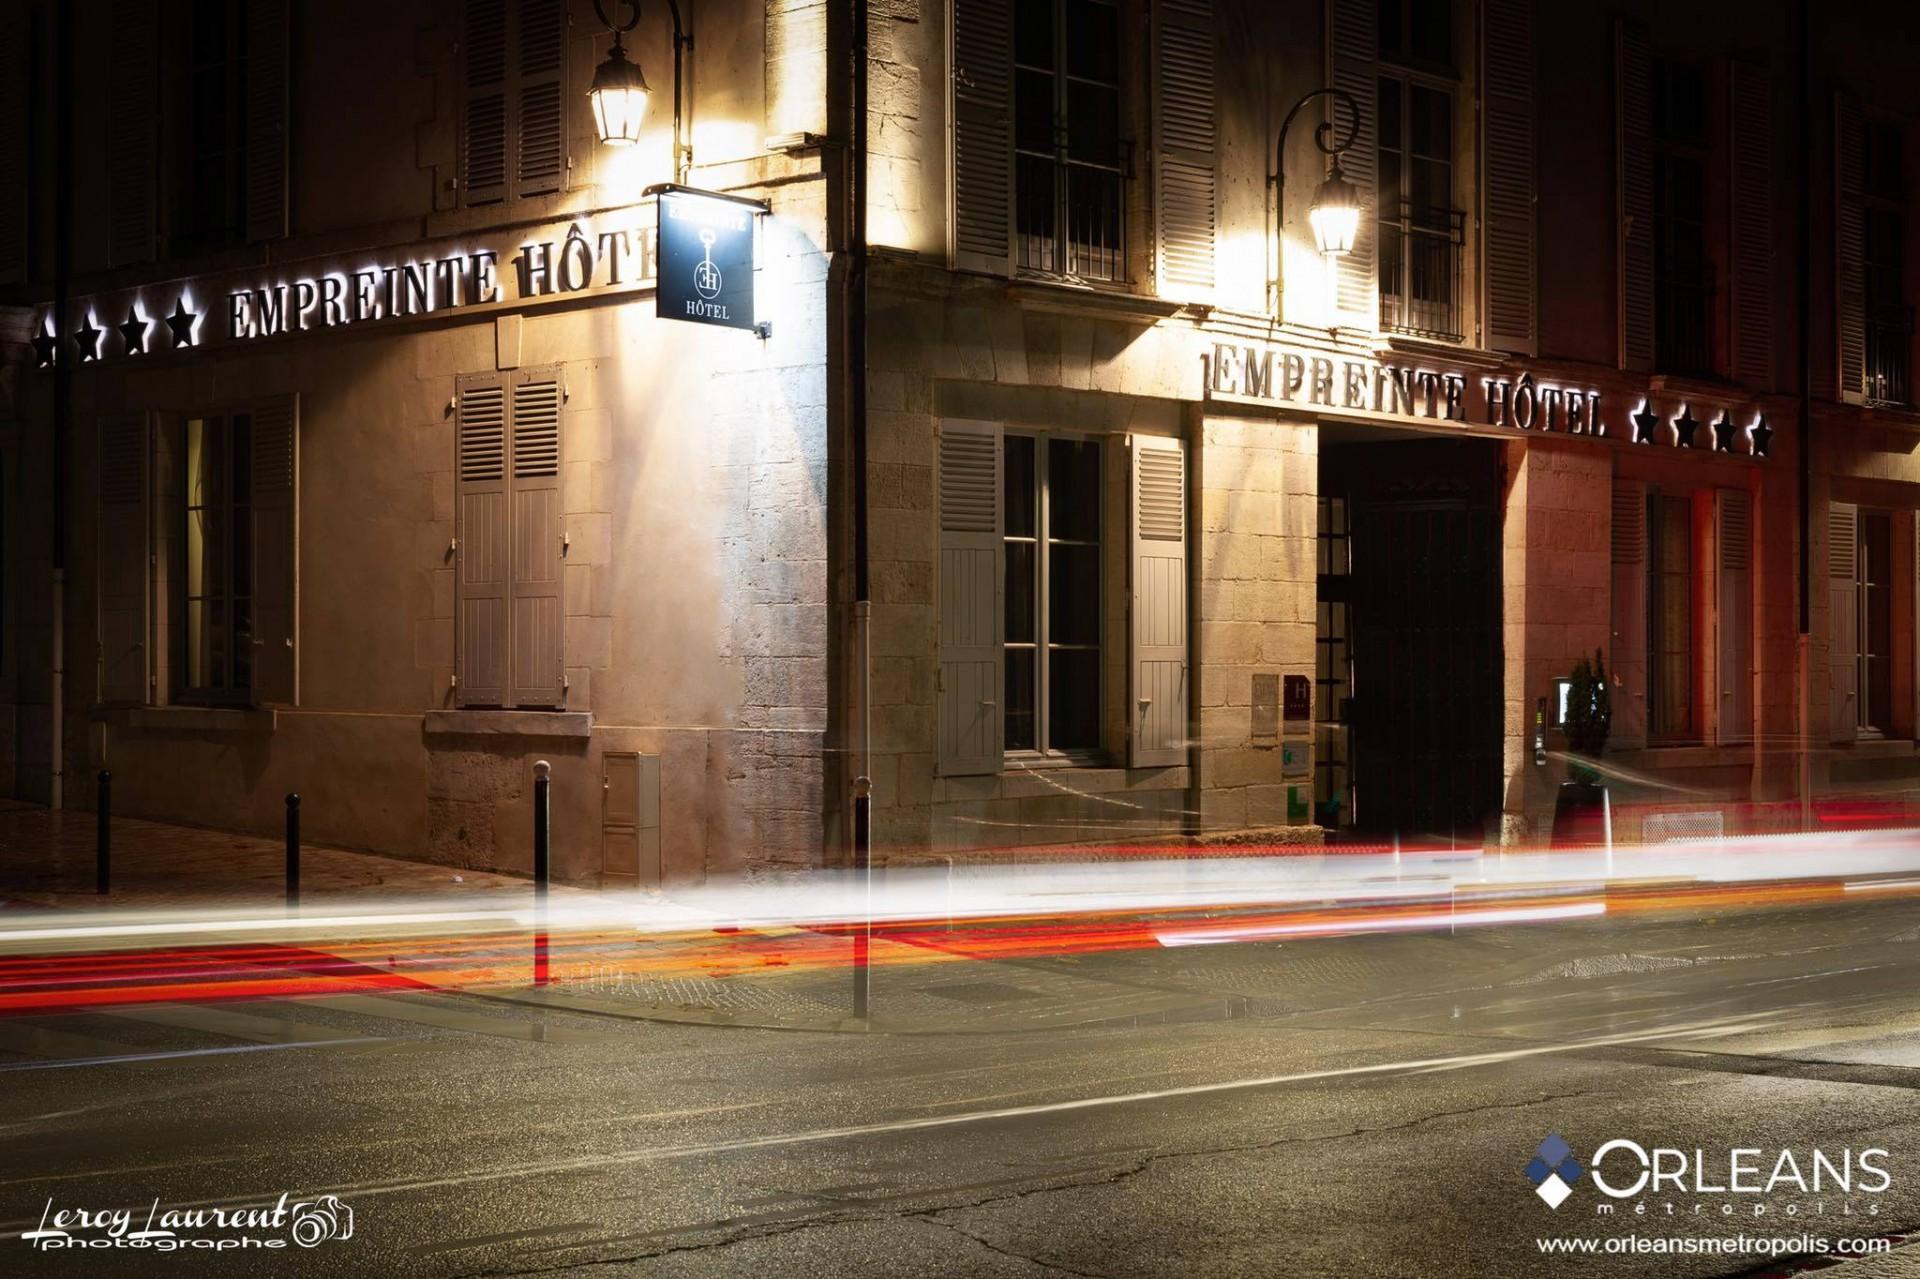 Empreinte Hôtel Orléans by Night